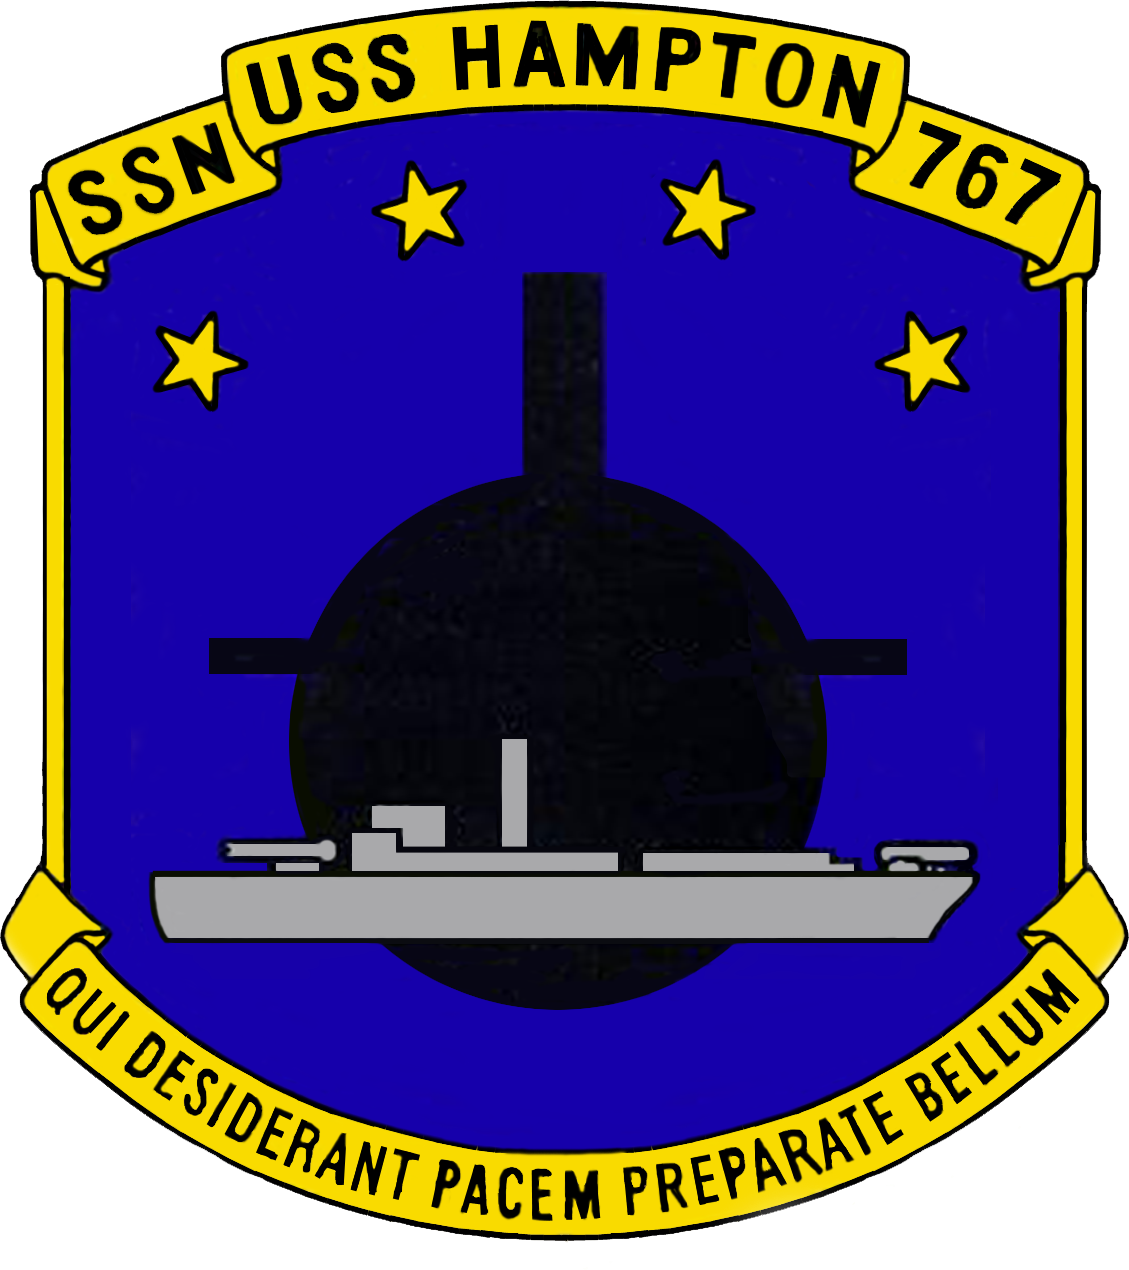 USS HAMPTON SSN-767 Crest Grafik: U.S. Navy